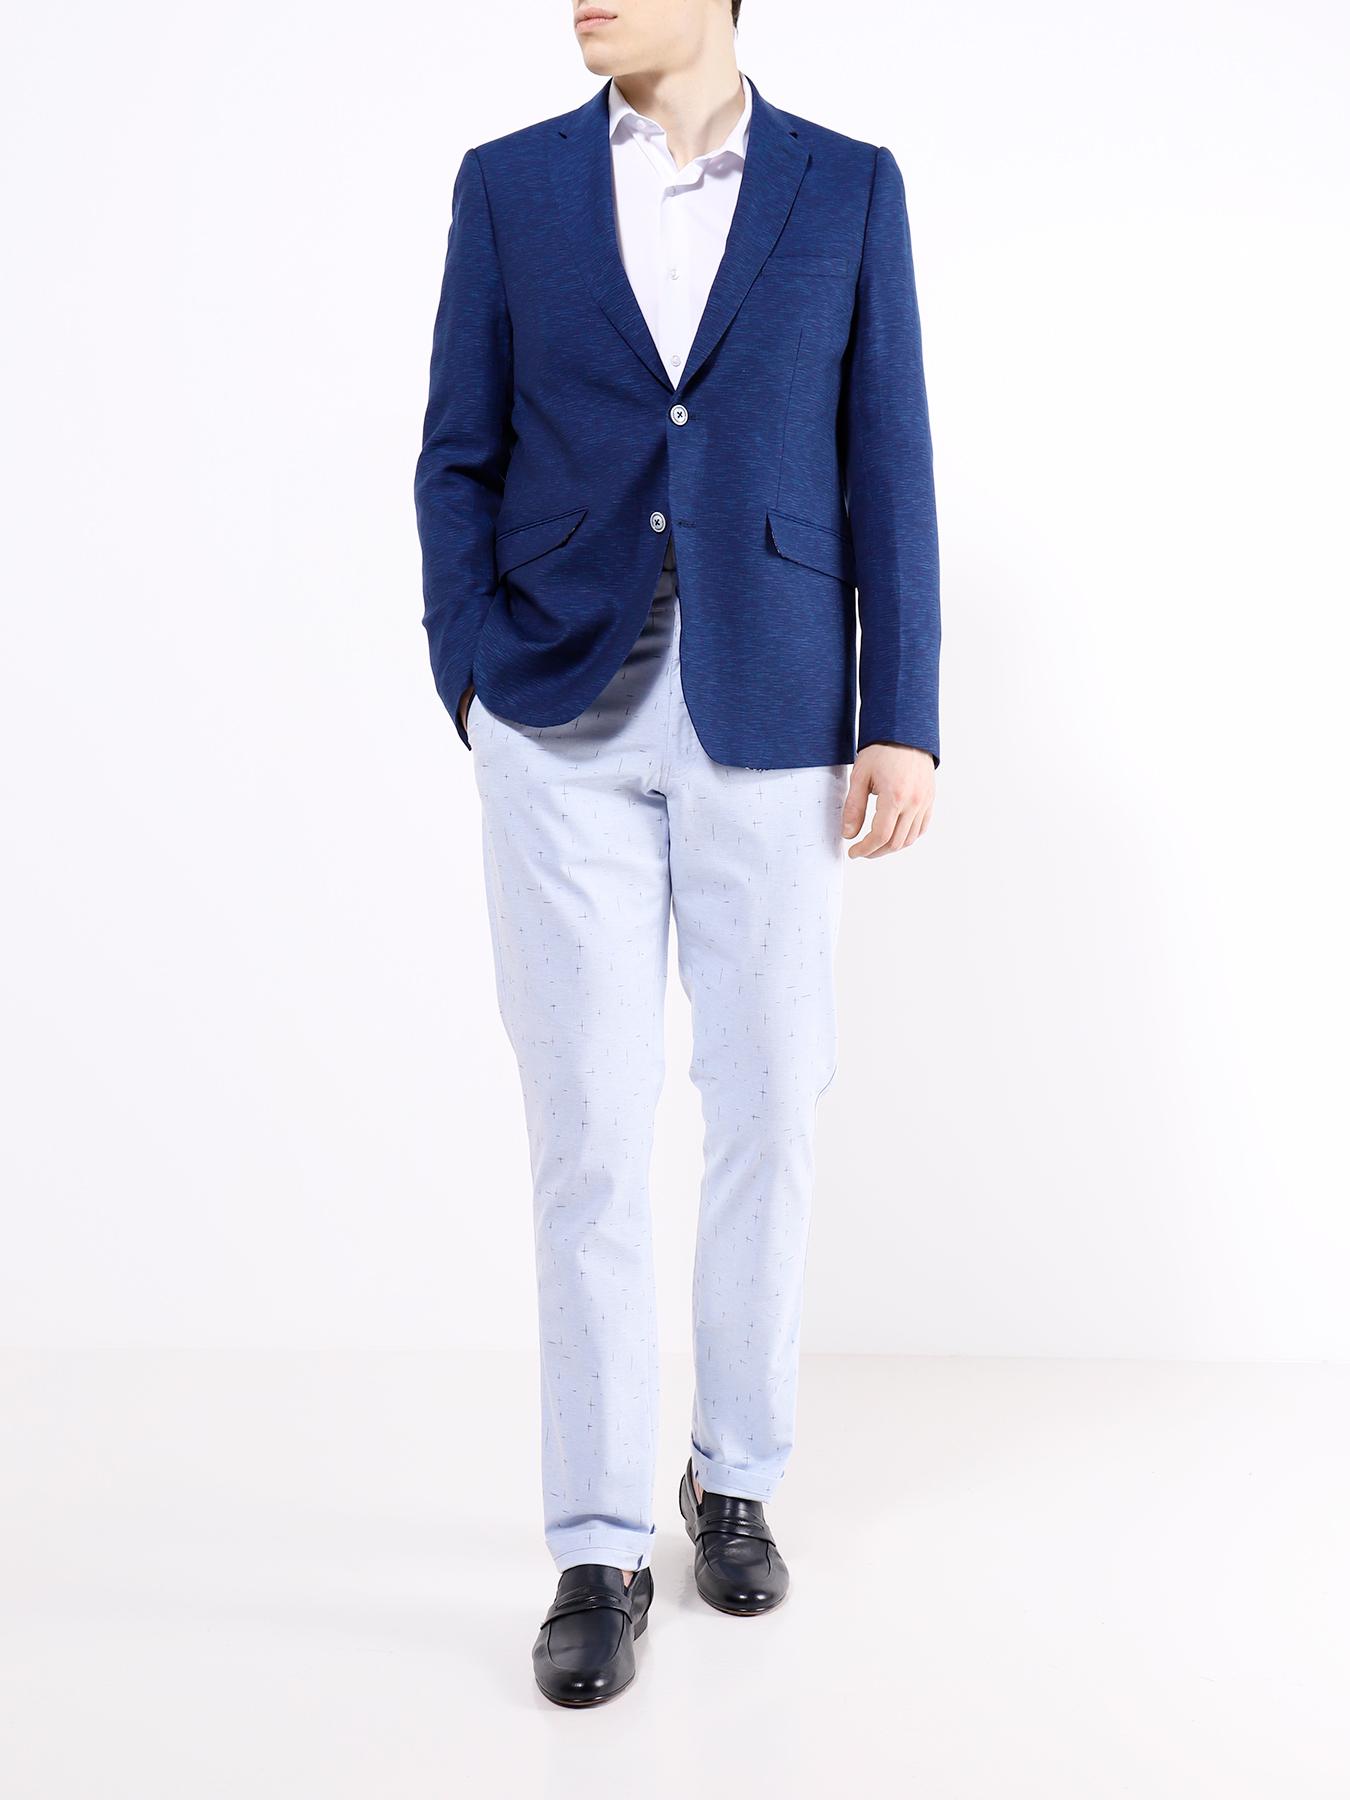 Брюки Ritter Jeans Мужские брюки